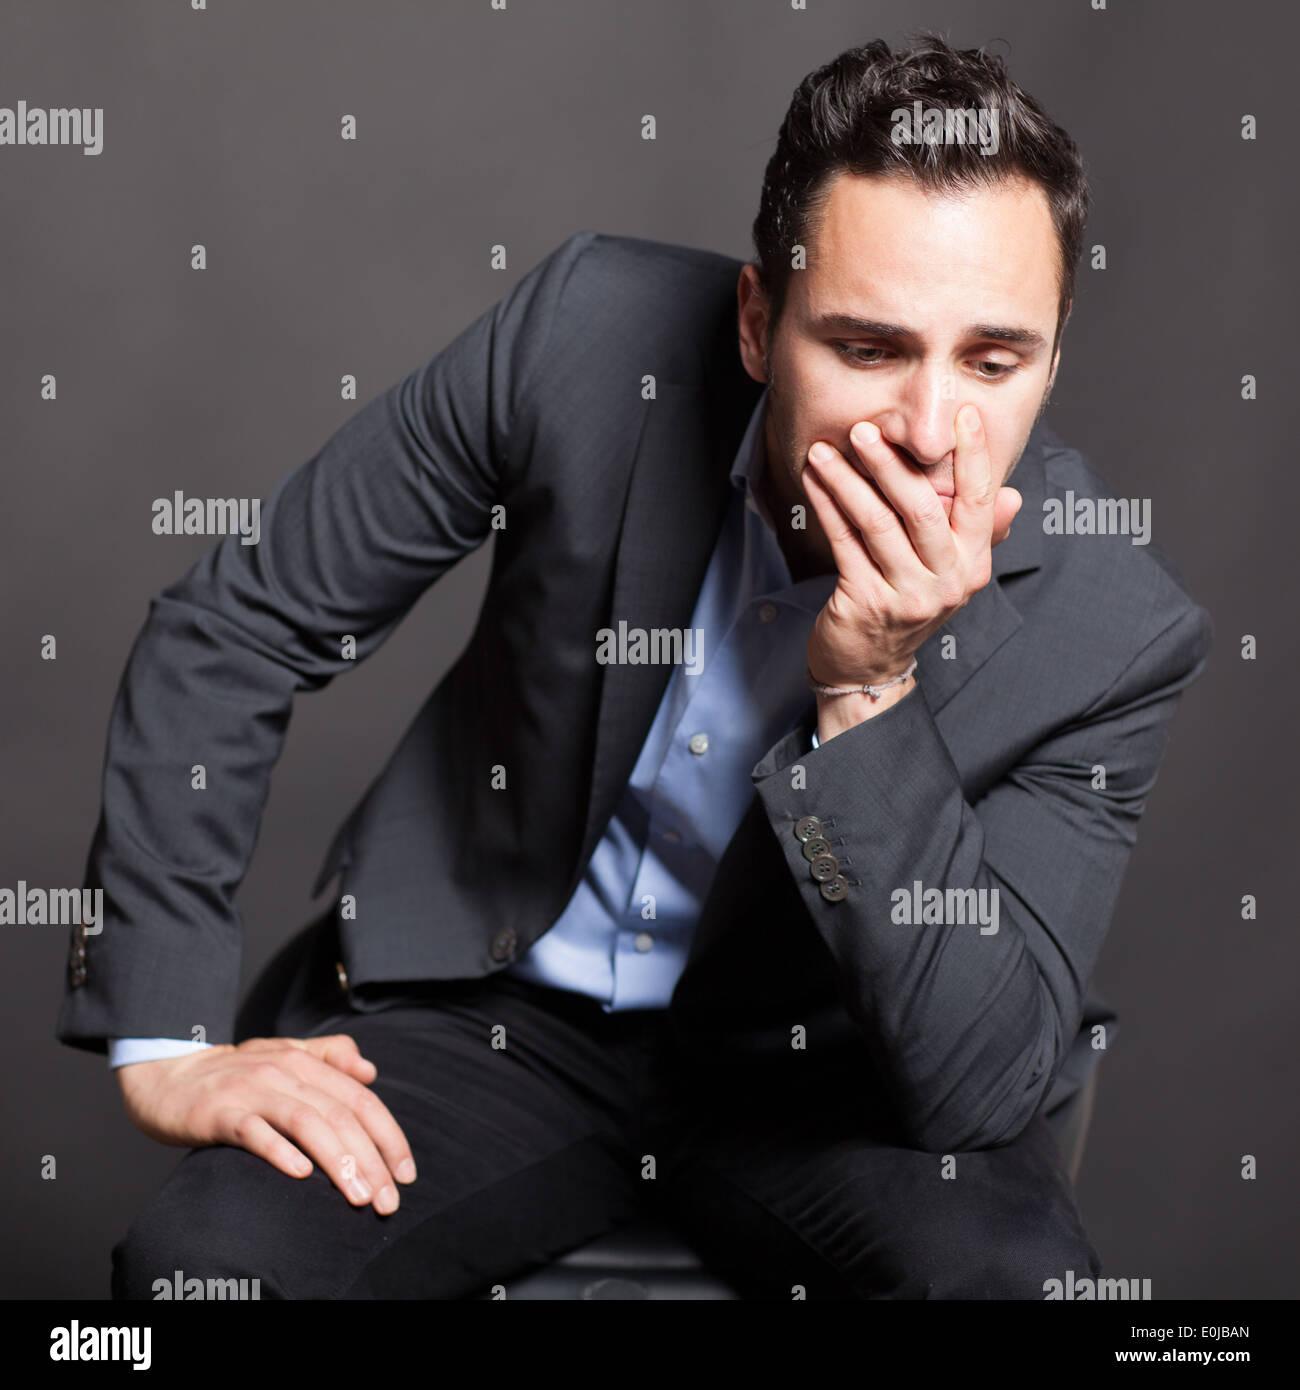 Man with depression - Stock Image